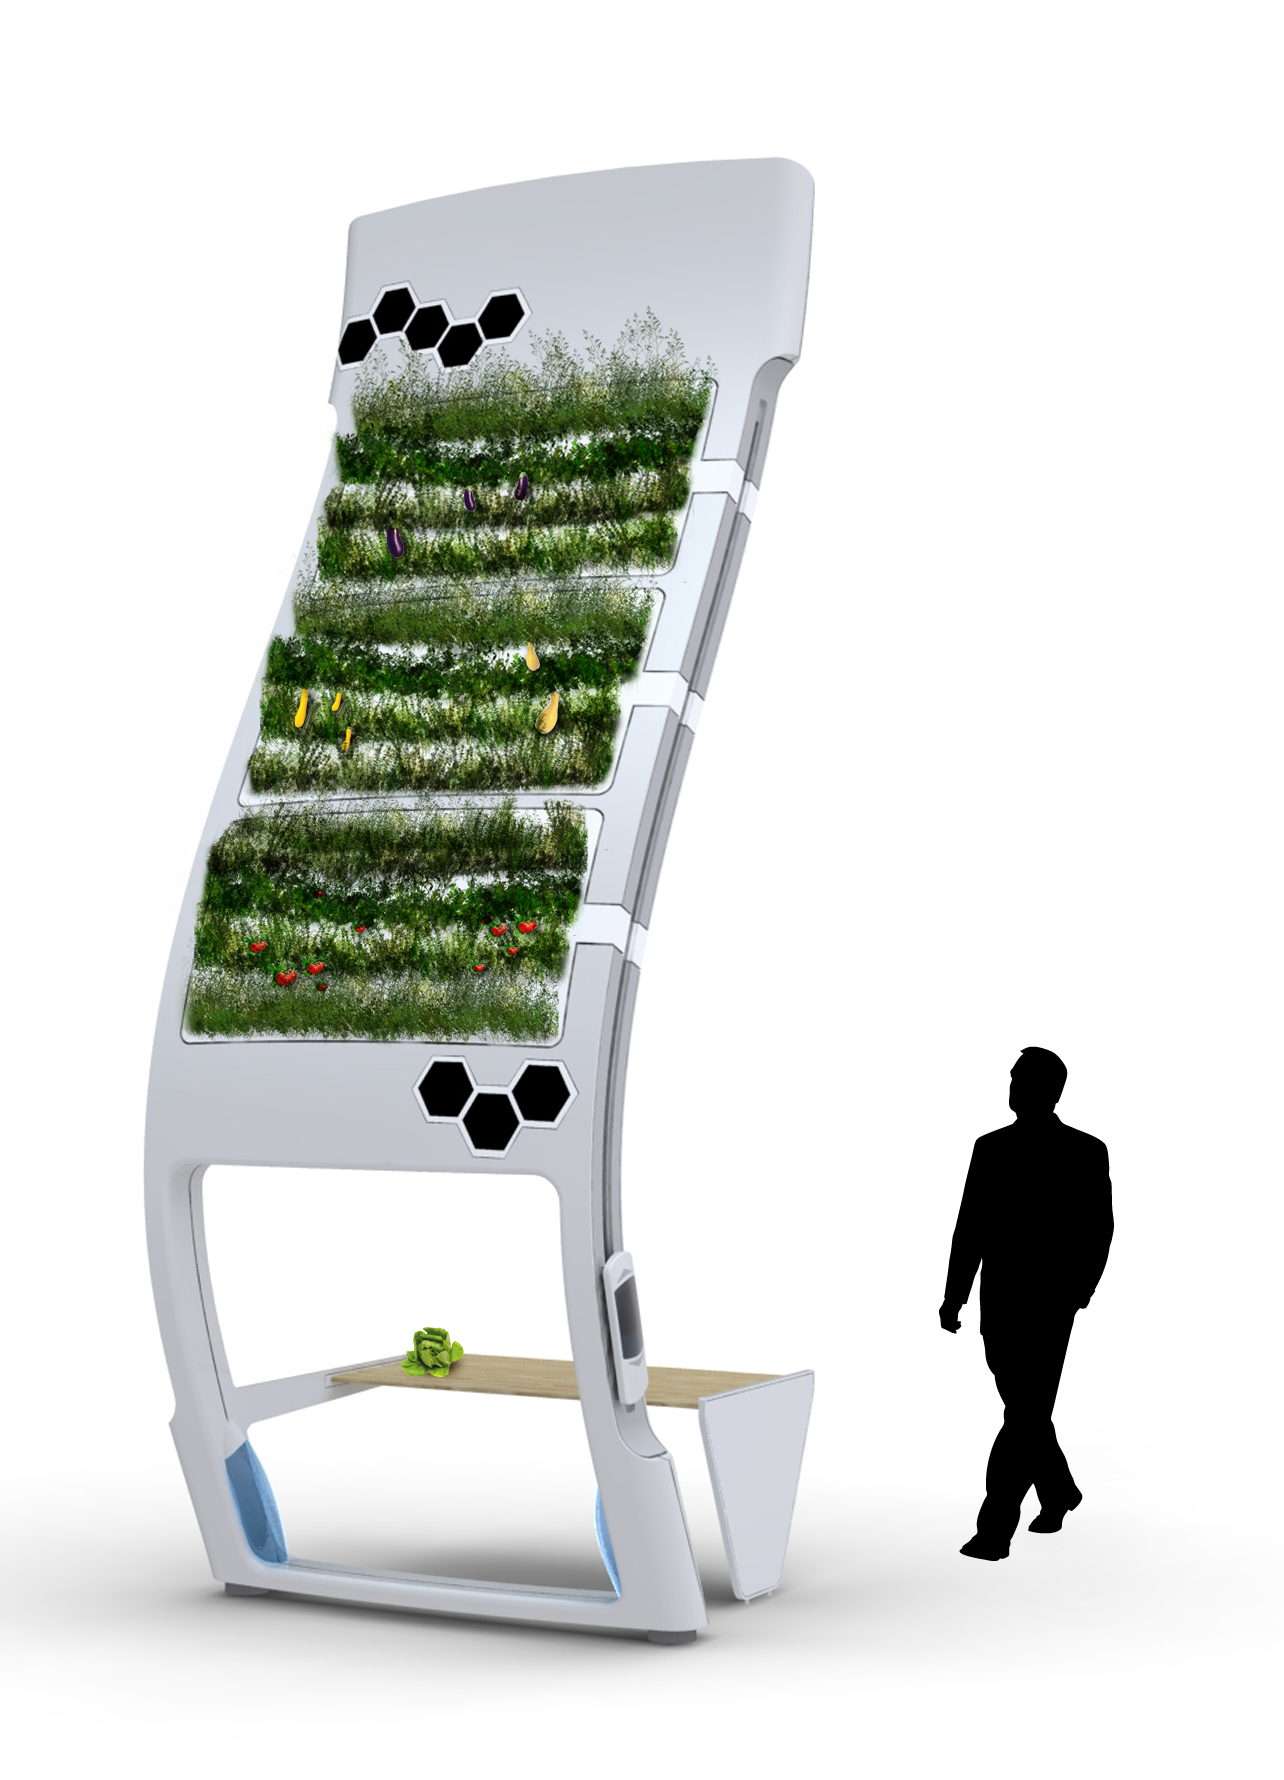 Aeroponic Garden System by Erik Campbell at Coroflotcom